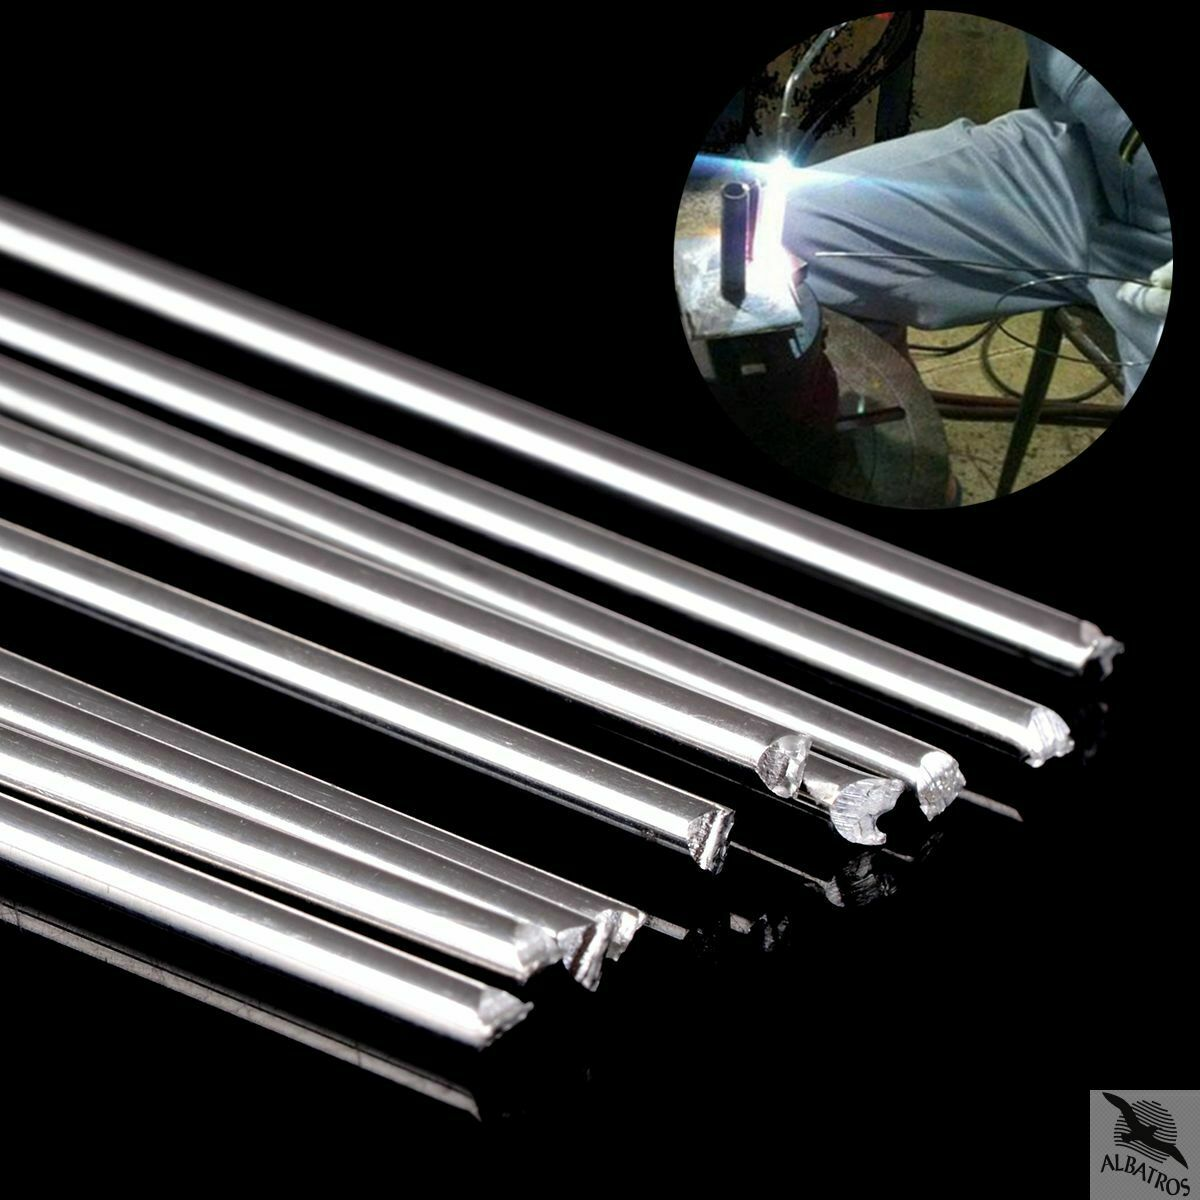 Easy Melt Welding Rods___ 10pcs - 1.6mmx45cm - Free Shipping 3